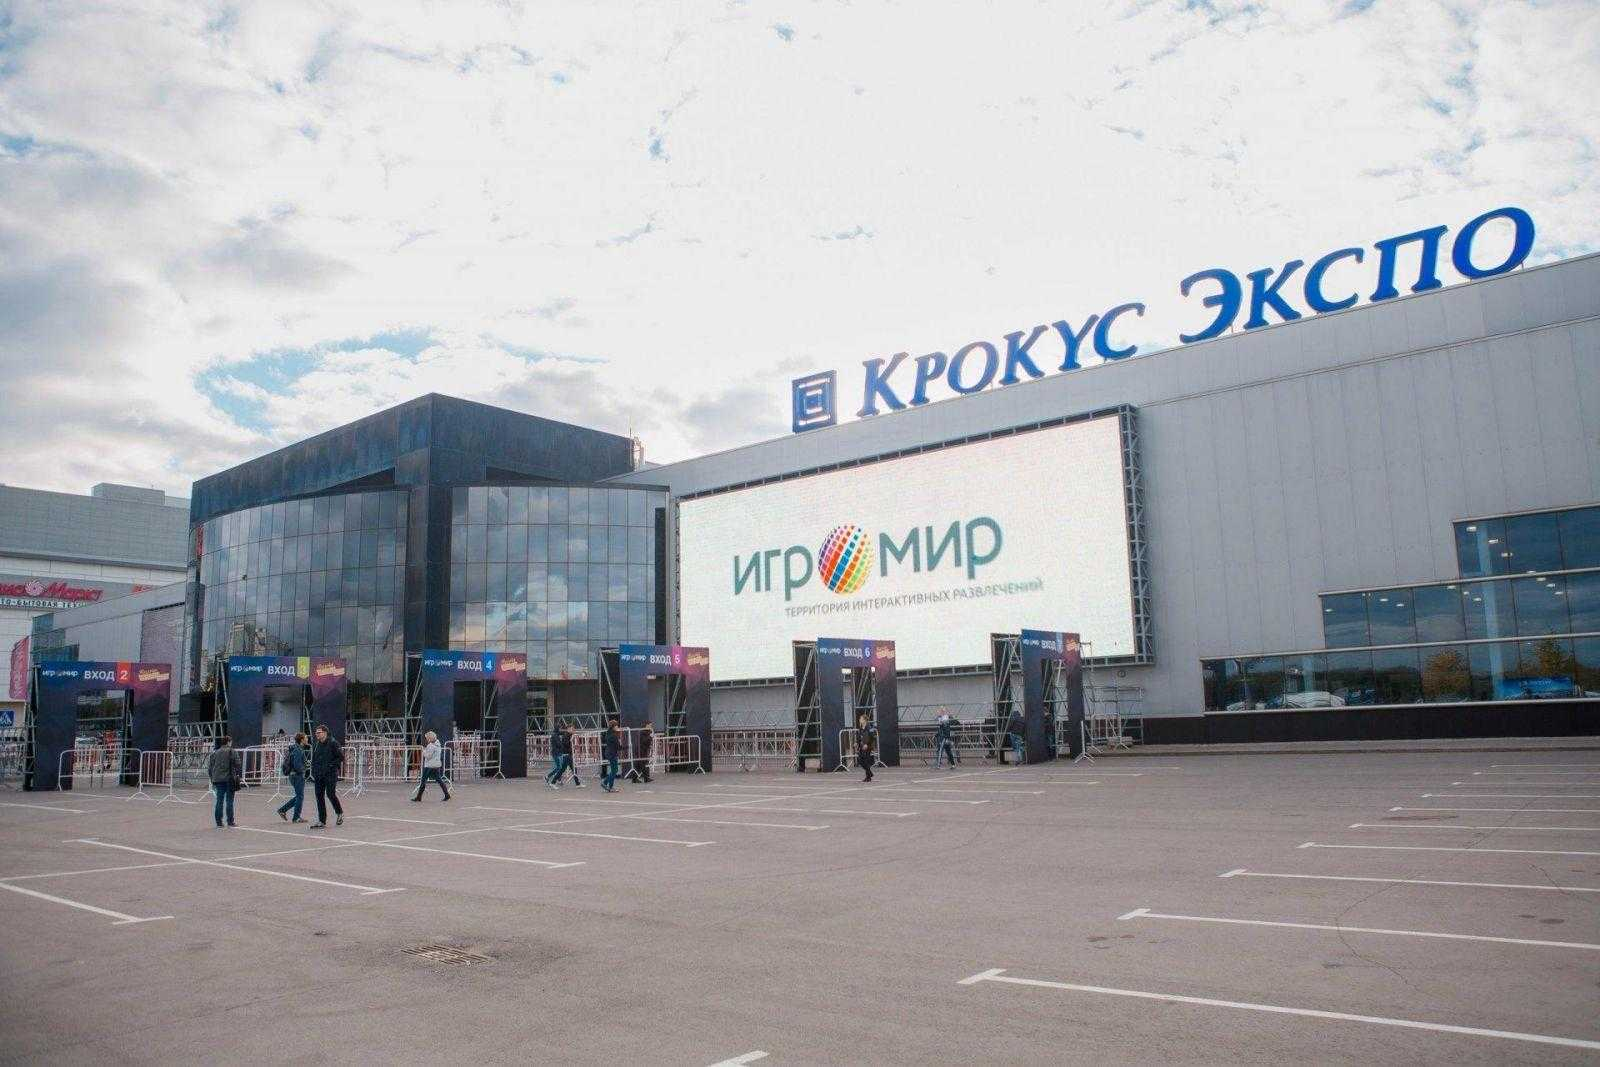 uv E3Mld6d0 - ИгроМир 2016 и Comic Con Russia открыли свои двери для всех